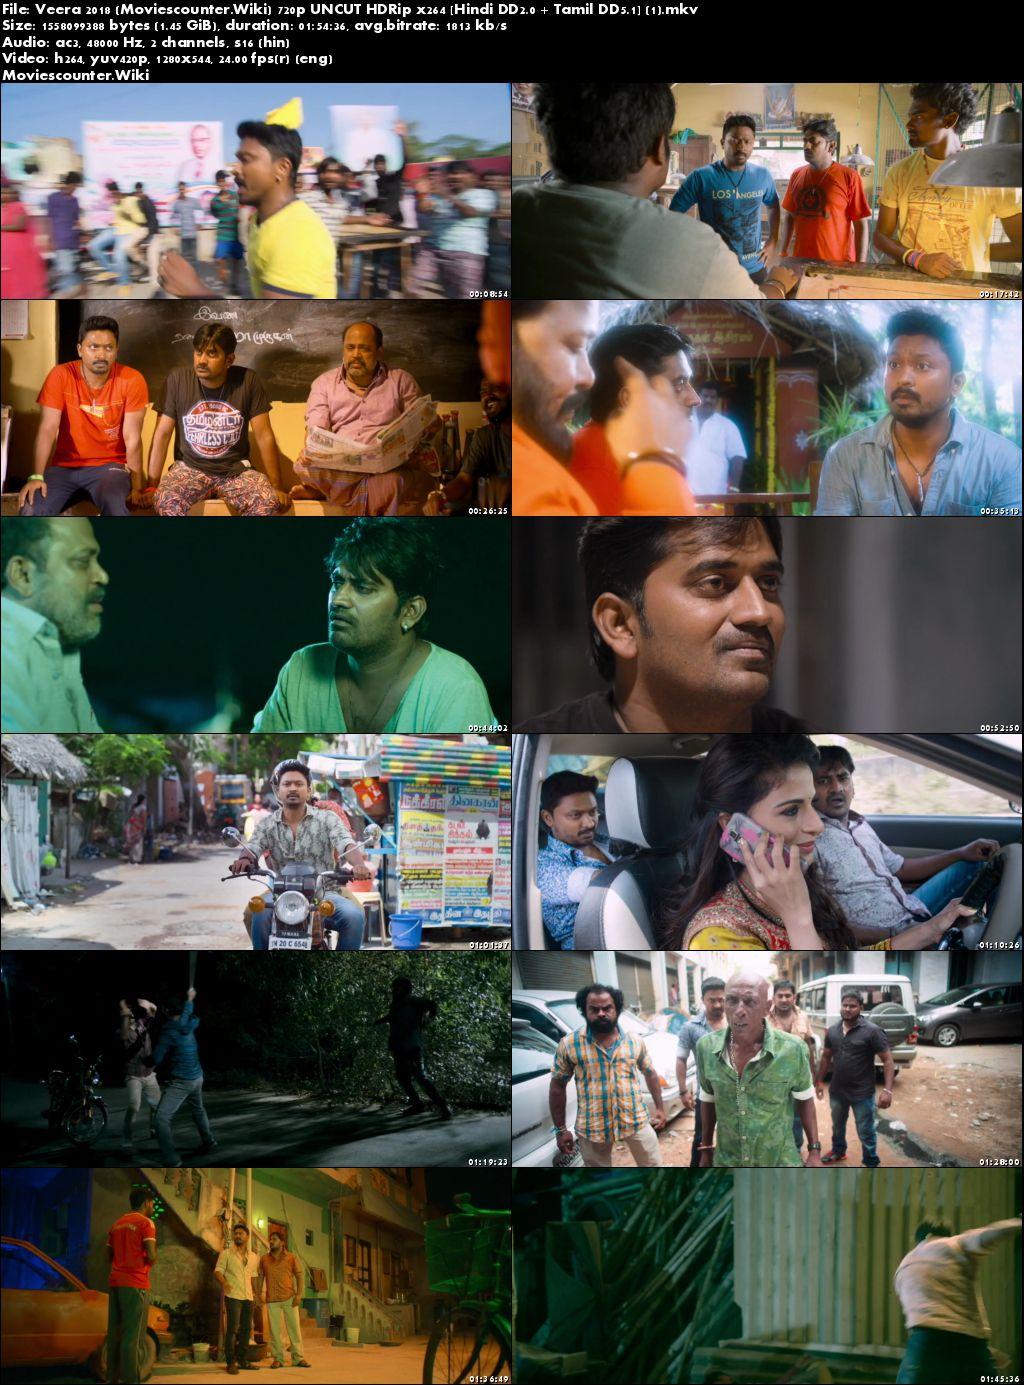 Screen Shots Veera 2018 Hindi Dubbed HD 720p